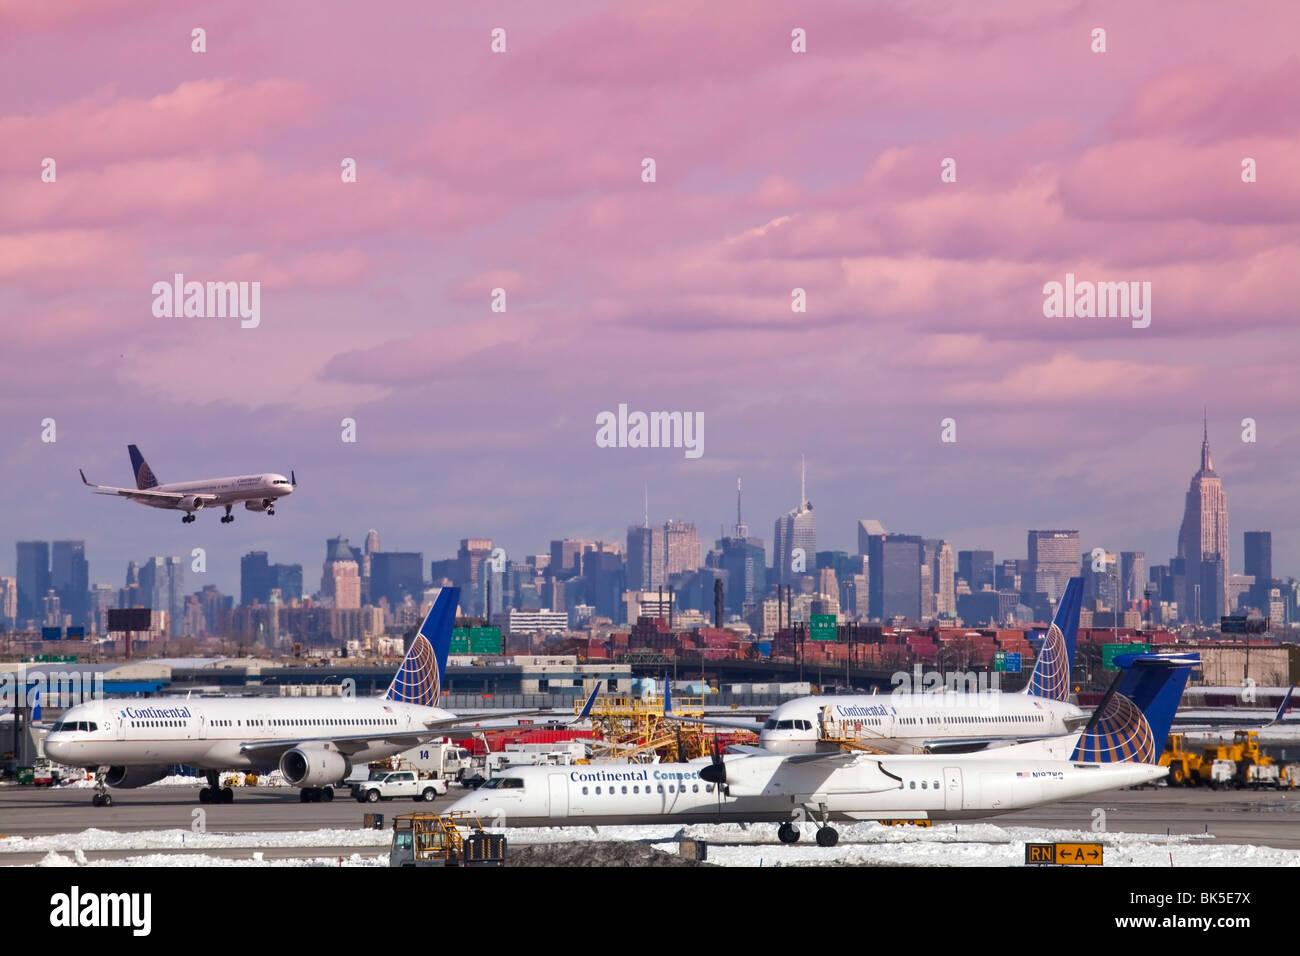 USA New York skyline and landing aeroplane at New Ark airport - Stock Image